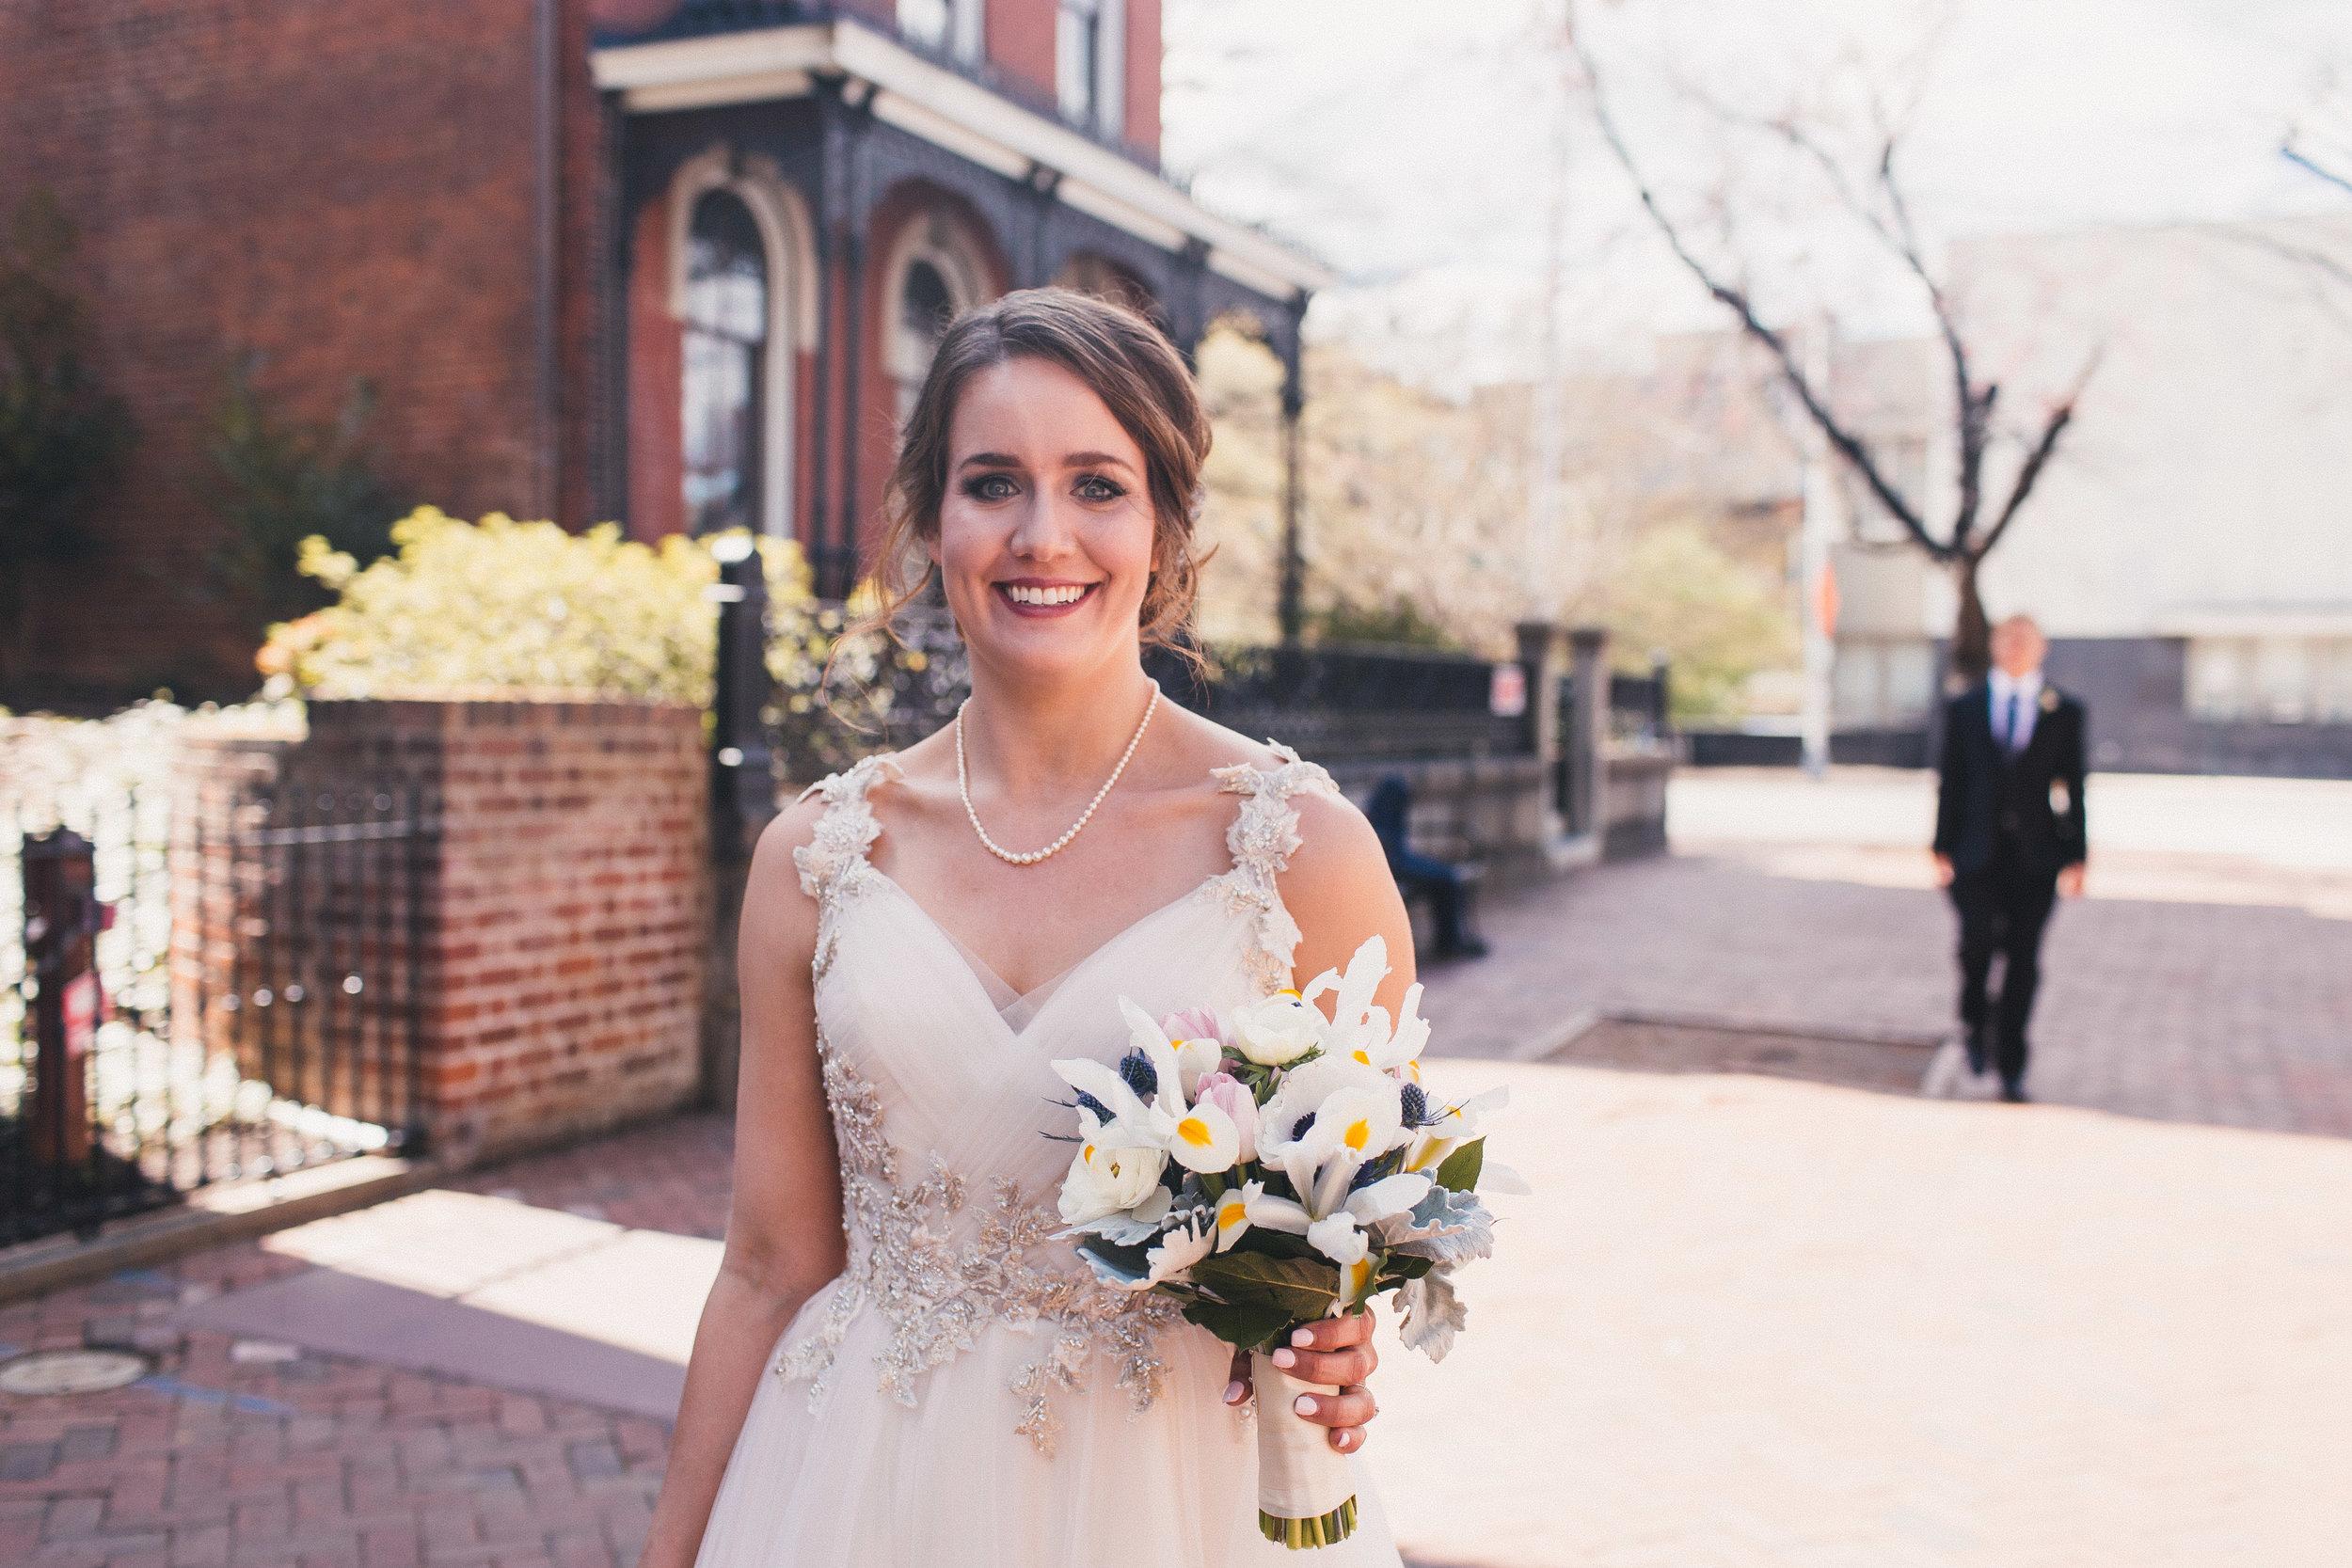 Lindsey & Bert - Wedding 4.1.17-330.jpg